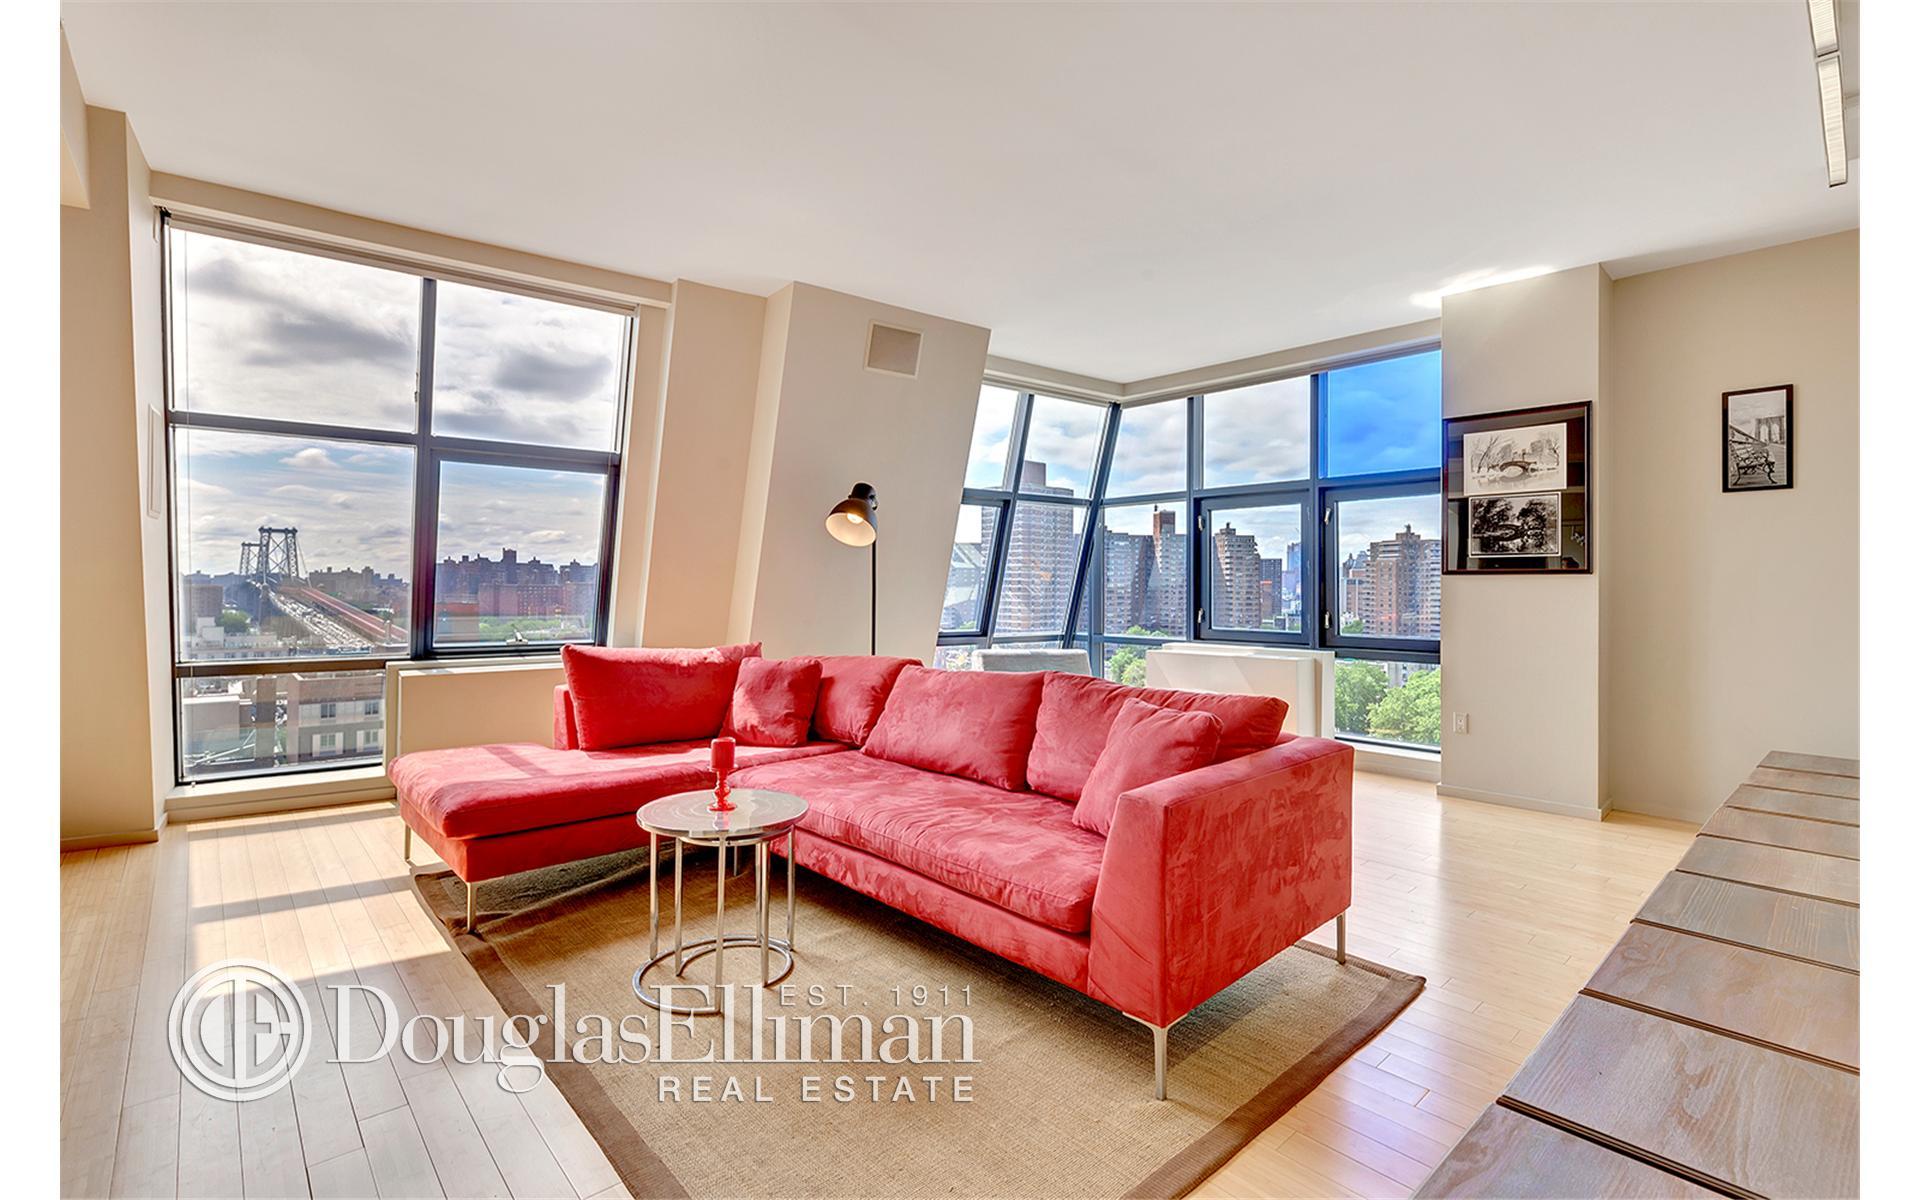 Condominium for Sale at Blue, Blue, 105 Norfolk Street New York, New York 10002 United States